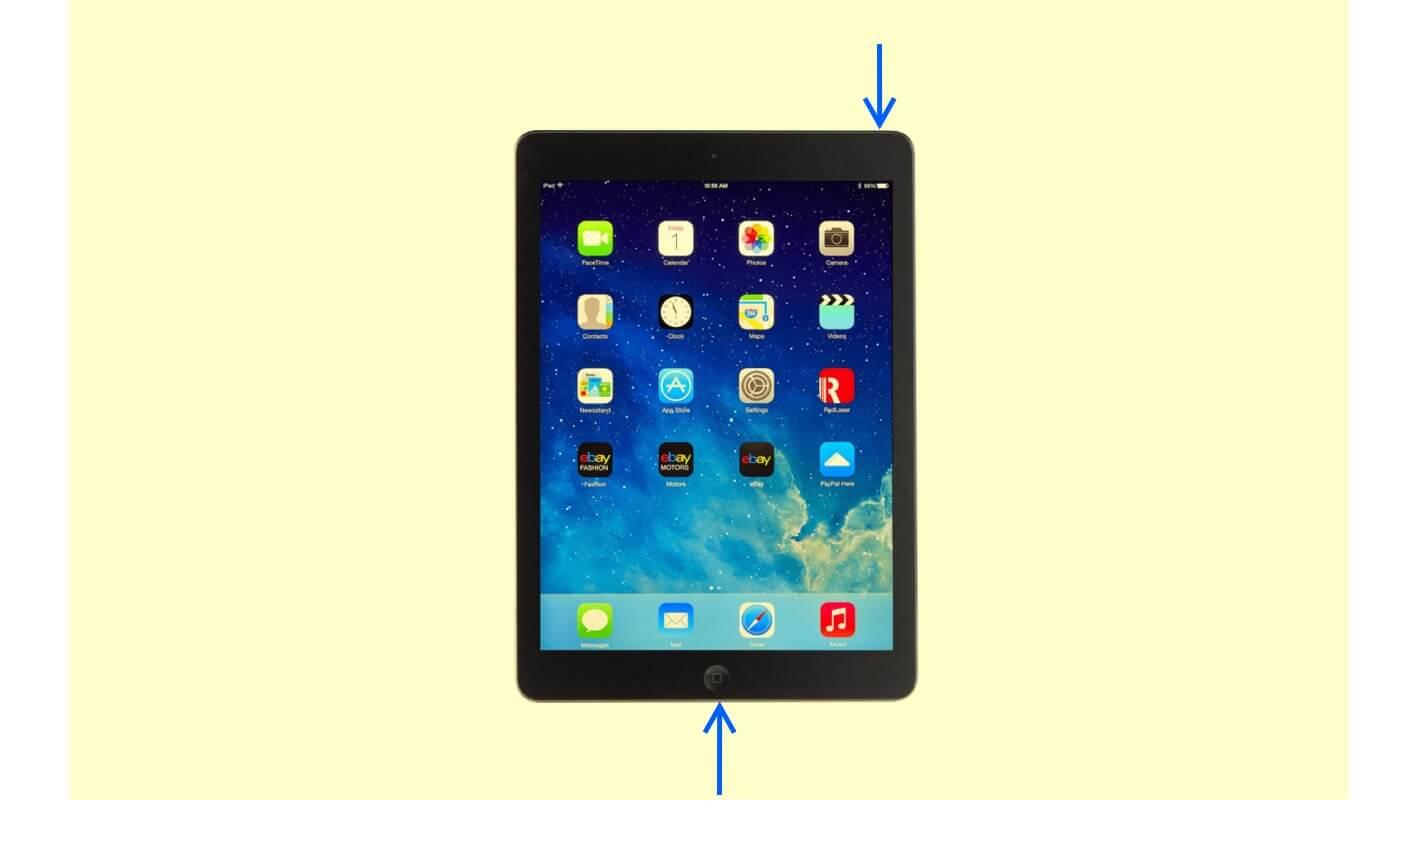 Take Screenshot on iPad with Touch ID